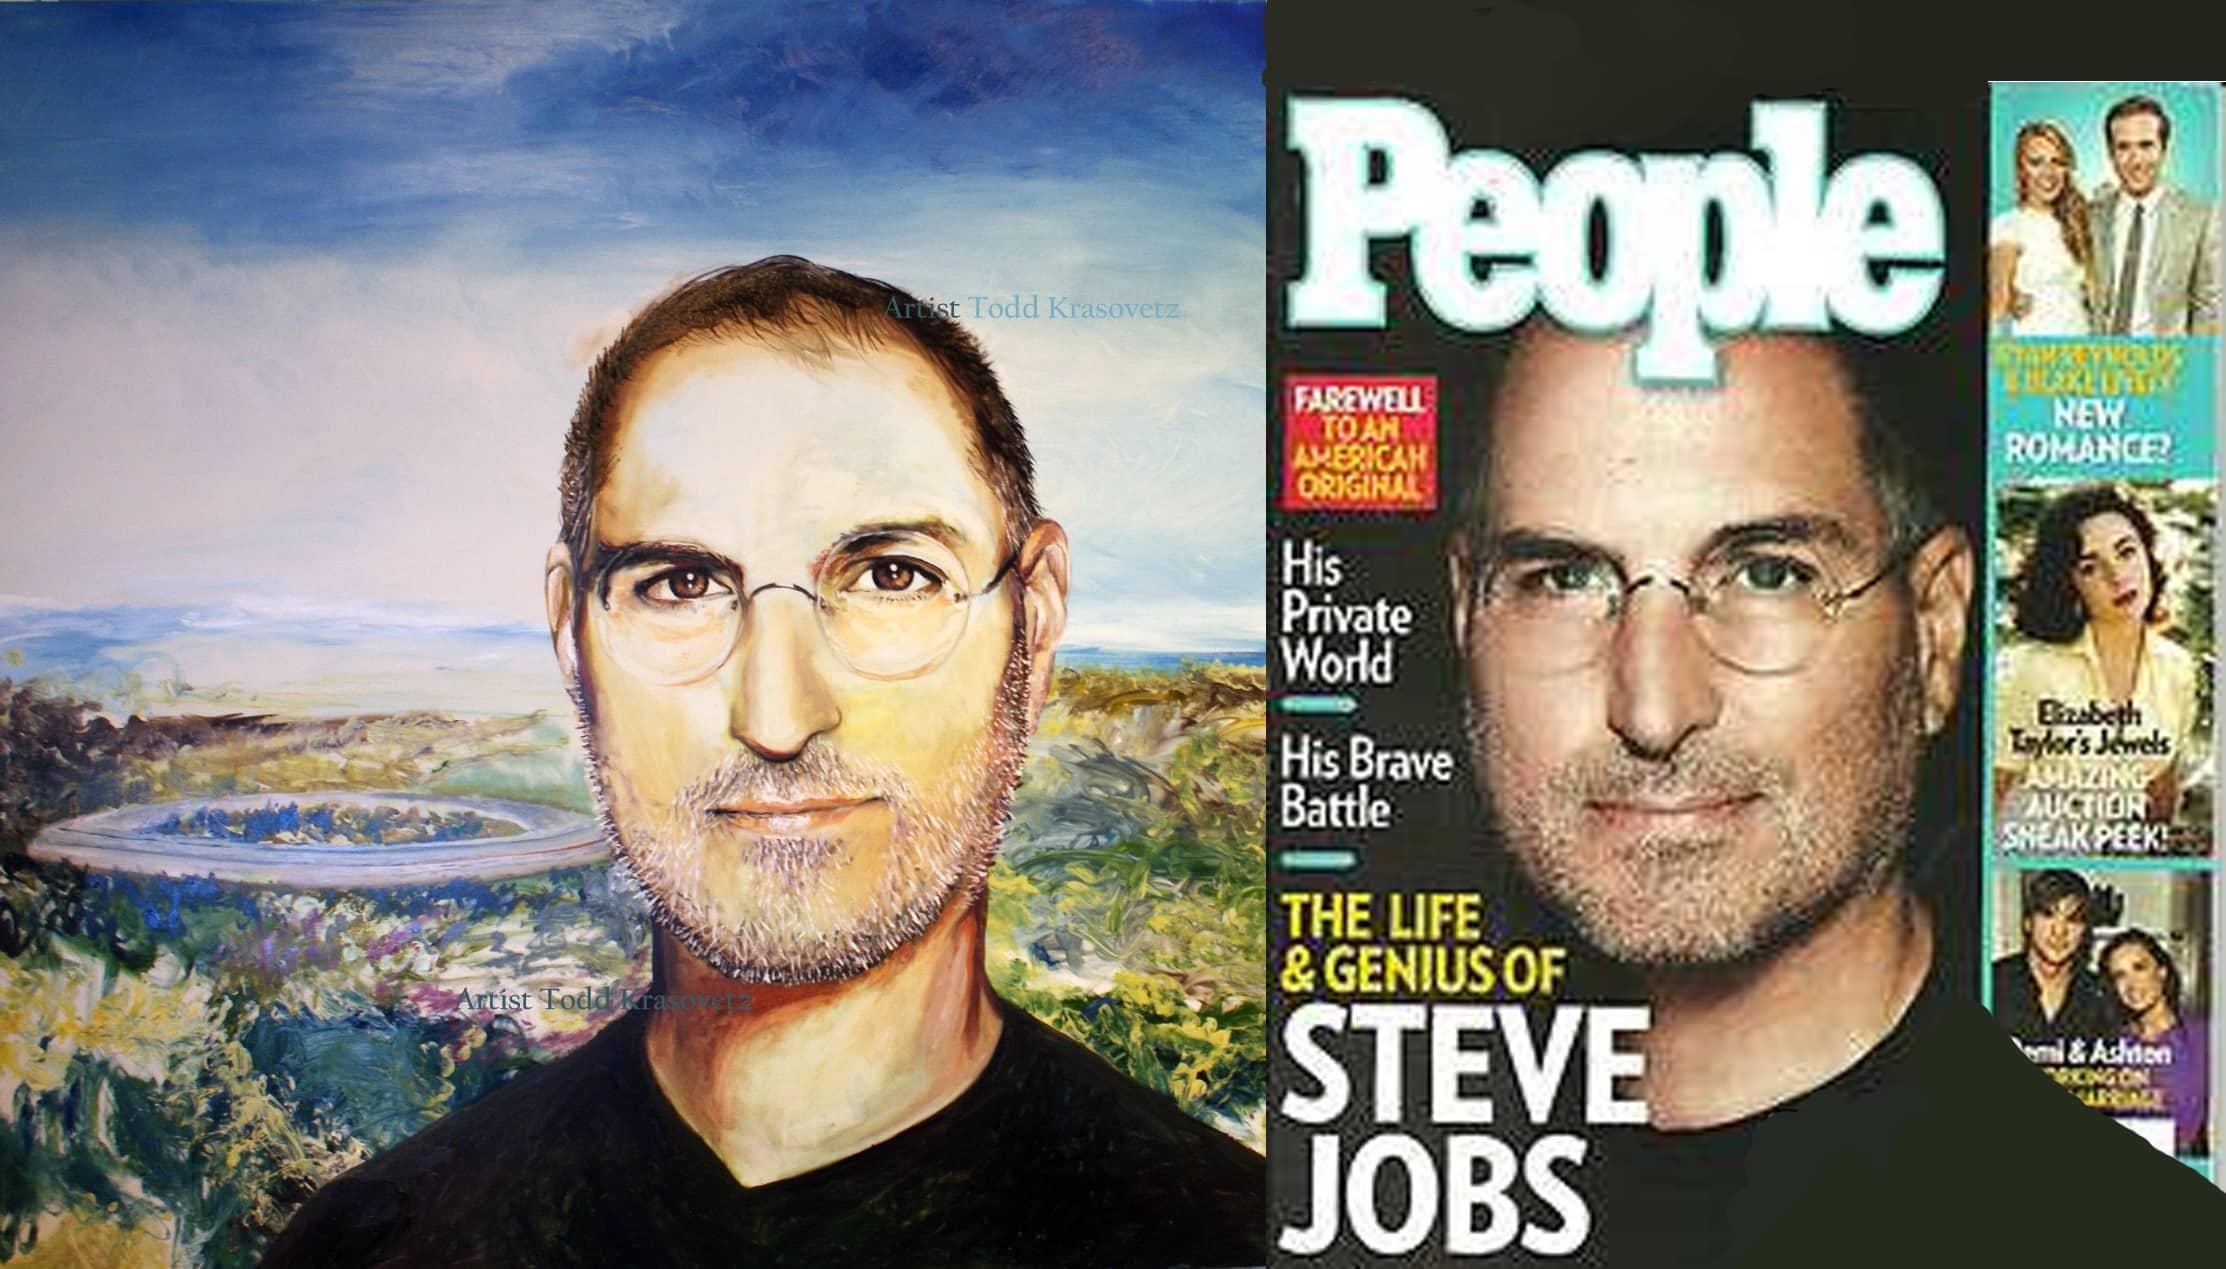 Oil Portrait form Photo by Artist Todd Krasovetz Steve Jobs Original Oil Painting 4 x 4 5 feet watermarked